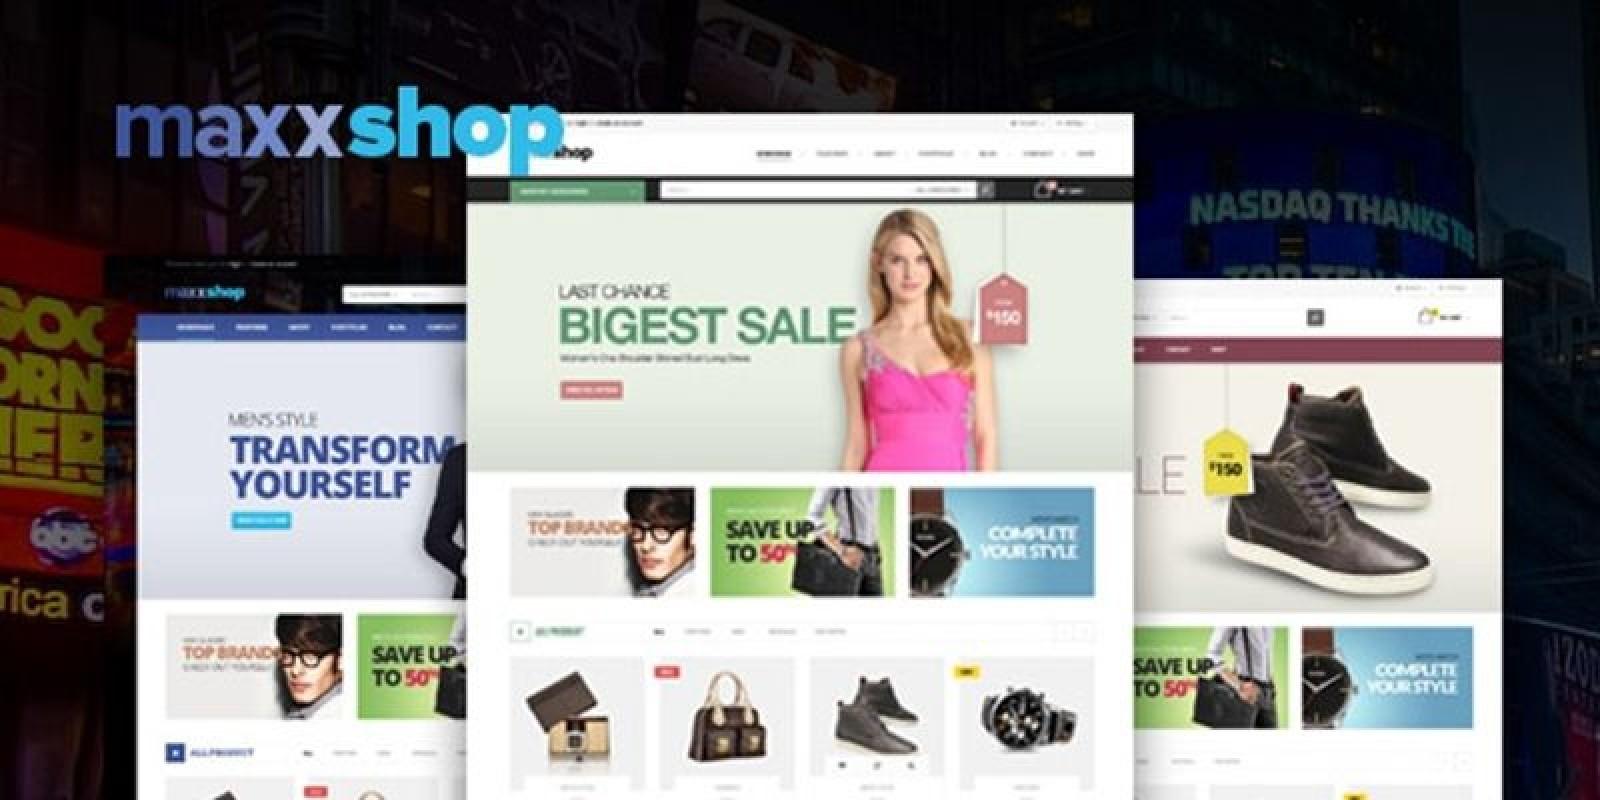 Maxx - Shopify Theme - Shopify Fashion Themes | Codester